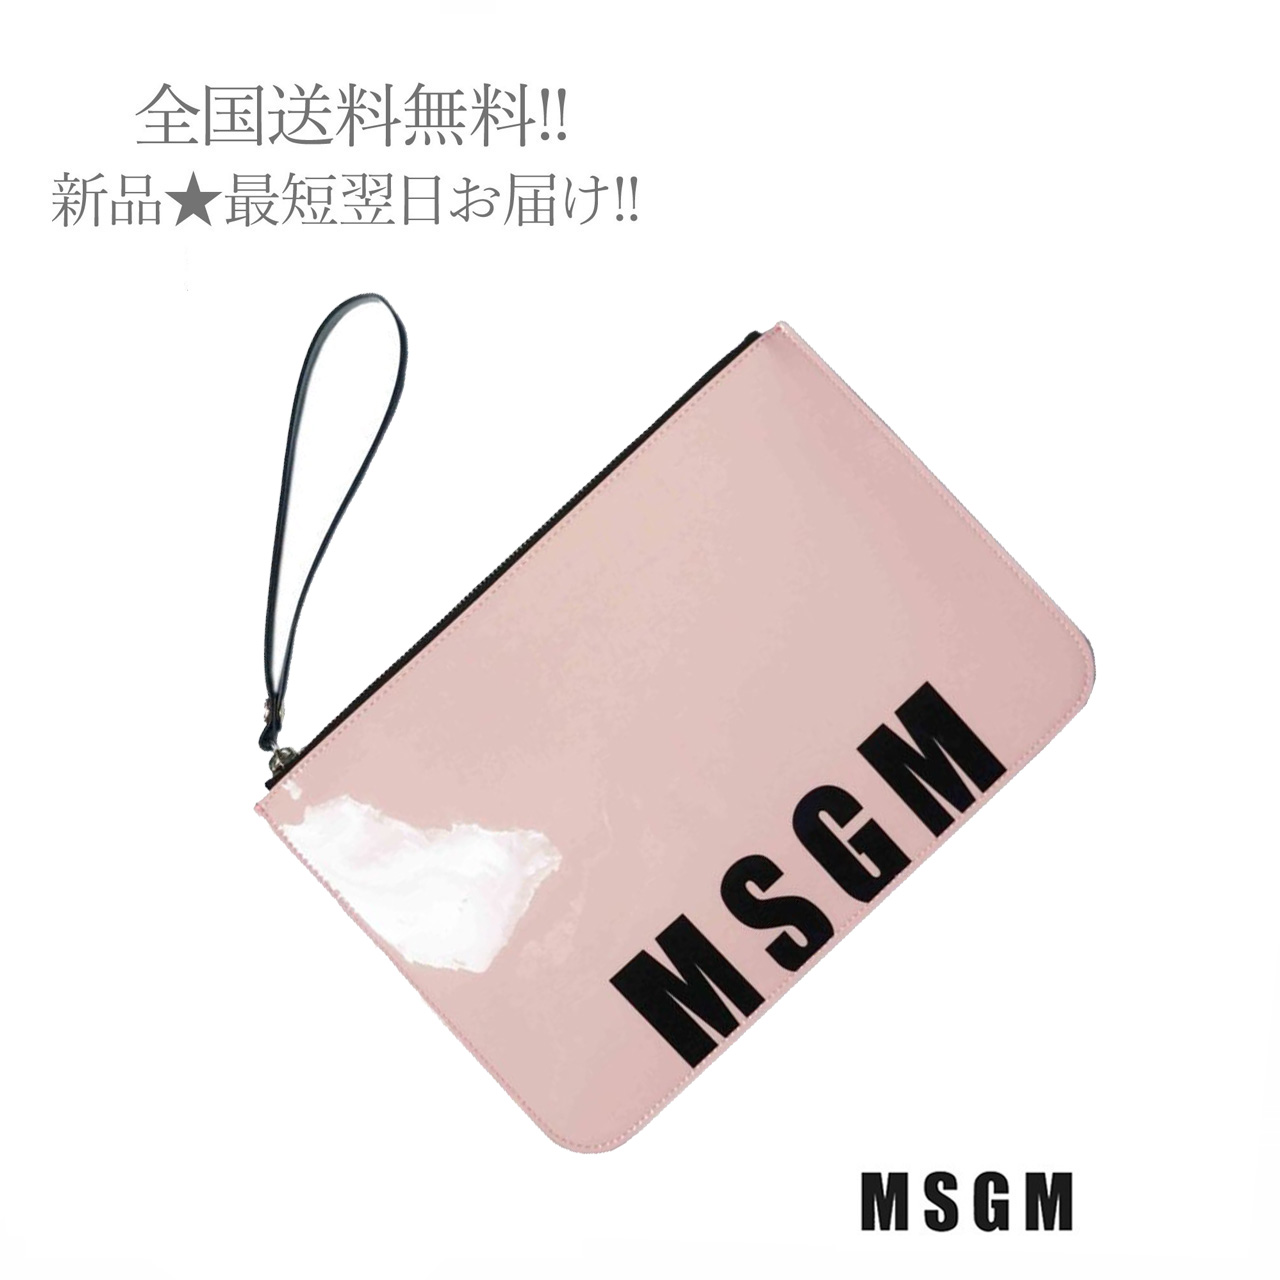 MSGM ミラノ限定 直接買付 多用途 日本最大級の品揃え 新品 クラッチバッグ 感謝価格 ピンク×ブラックロゴ